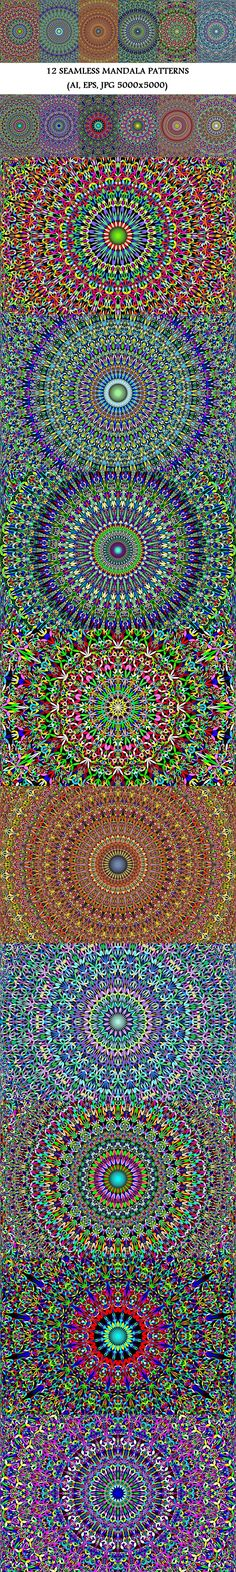 12 Floral Mandala Seamless Patterns #floral #GraphicDesign #MandalaGraphics #design #boho #repeat #boho #bohemian #BohoDesign #BohemianDesign #mandala #background #MandalaDesign #ornament #MandalaArt #MandalaPatternDesign #SeamlessMandalaPatterns #background #mandala #MandalaPatterns Mandala Pattern, Mandala Design, Pattern Art, Pattern Design, Square Patterns, Flower Patterns, Color Patterns, Mandala Floral, Mandala Art